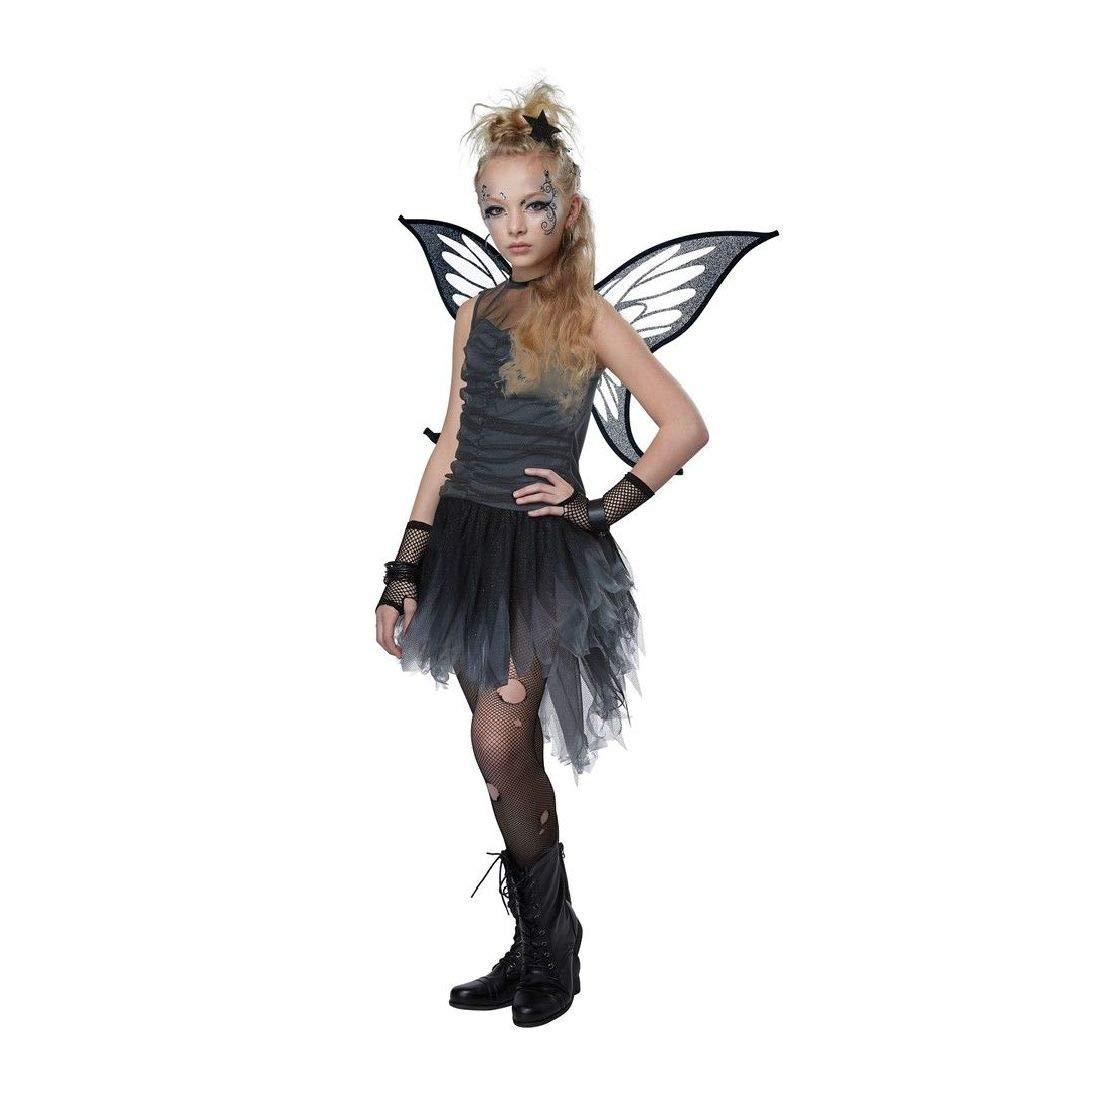 Ovedcray Costume series APPAREL ガールズ Medium (8-10)  B07H4K57HG